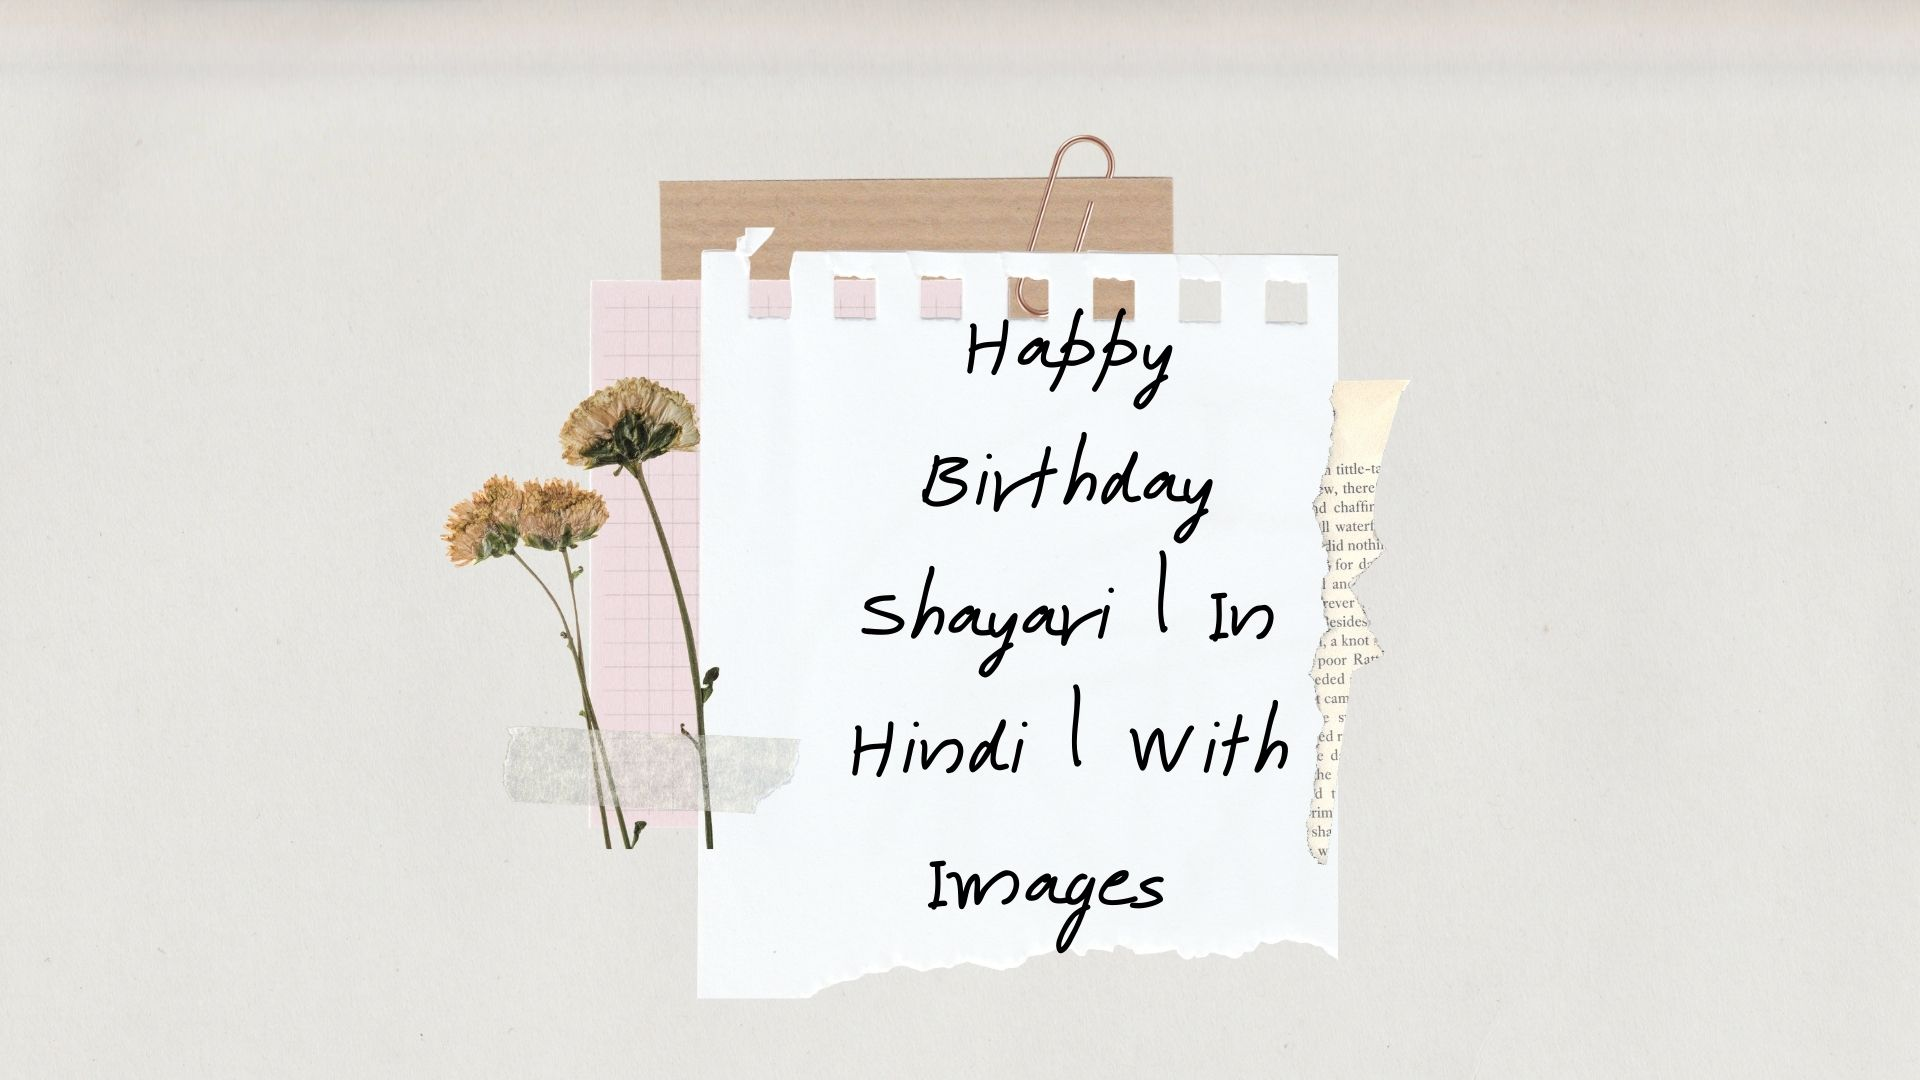 Happy Birthday Shayari | In Hindi | With Images